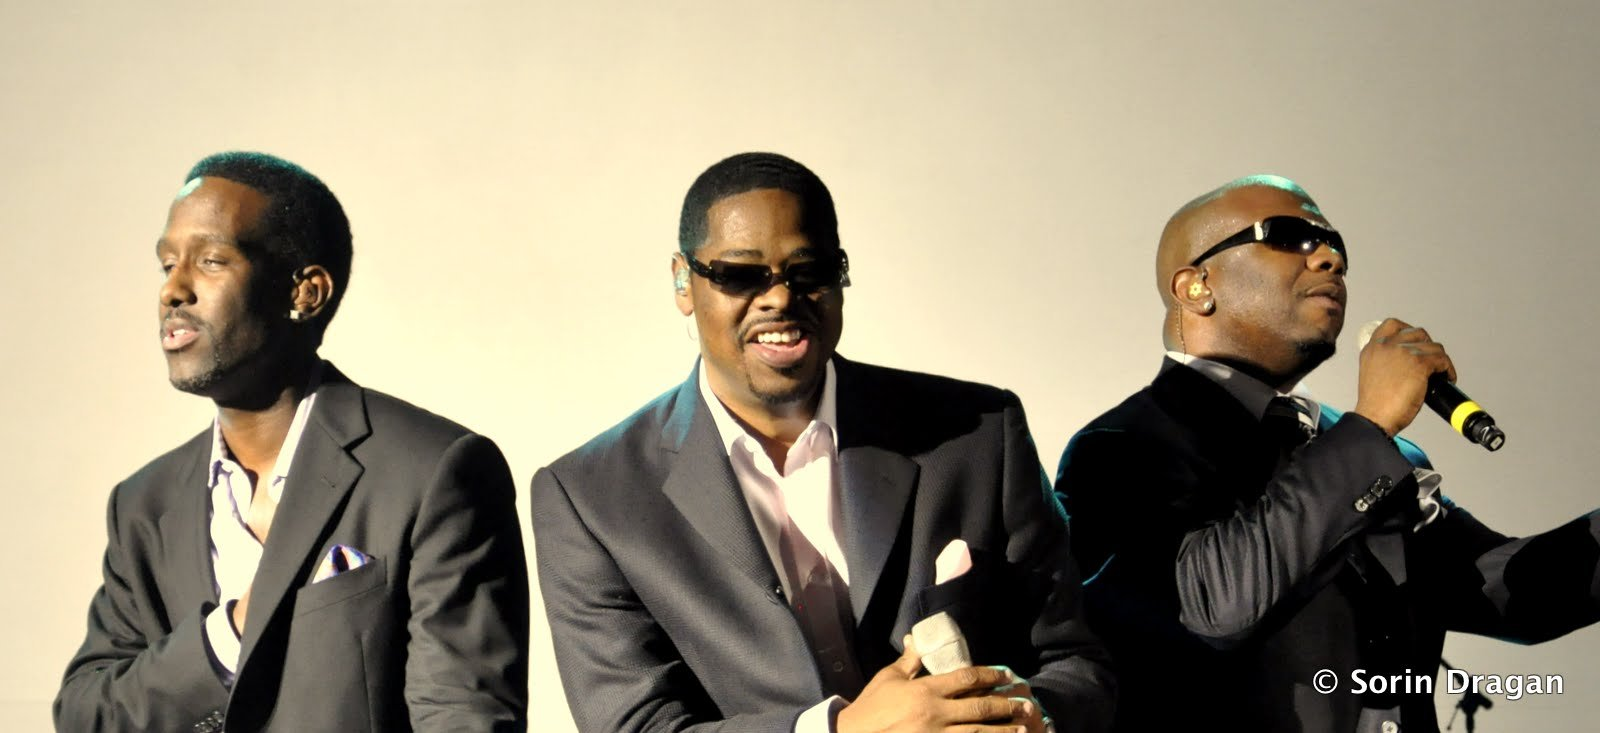 Boyz II Men Pictures | MetroLyrics